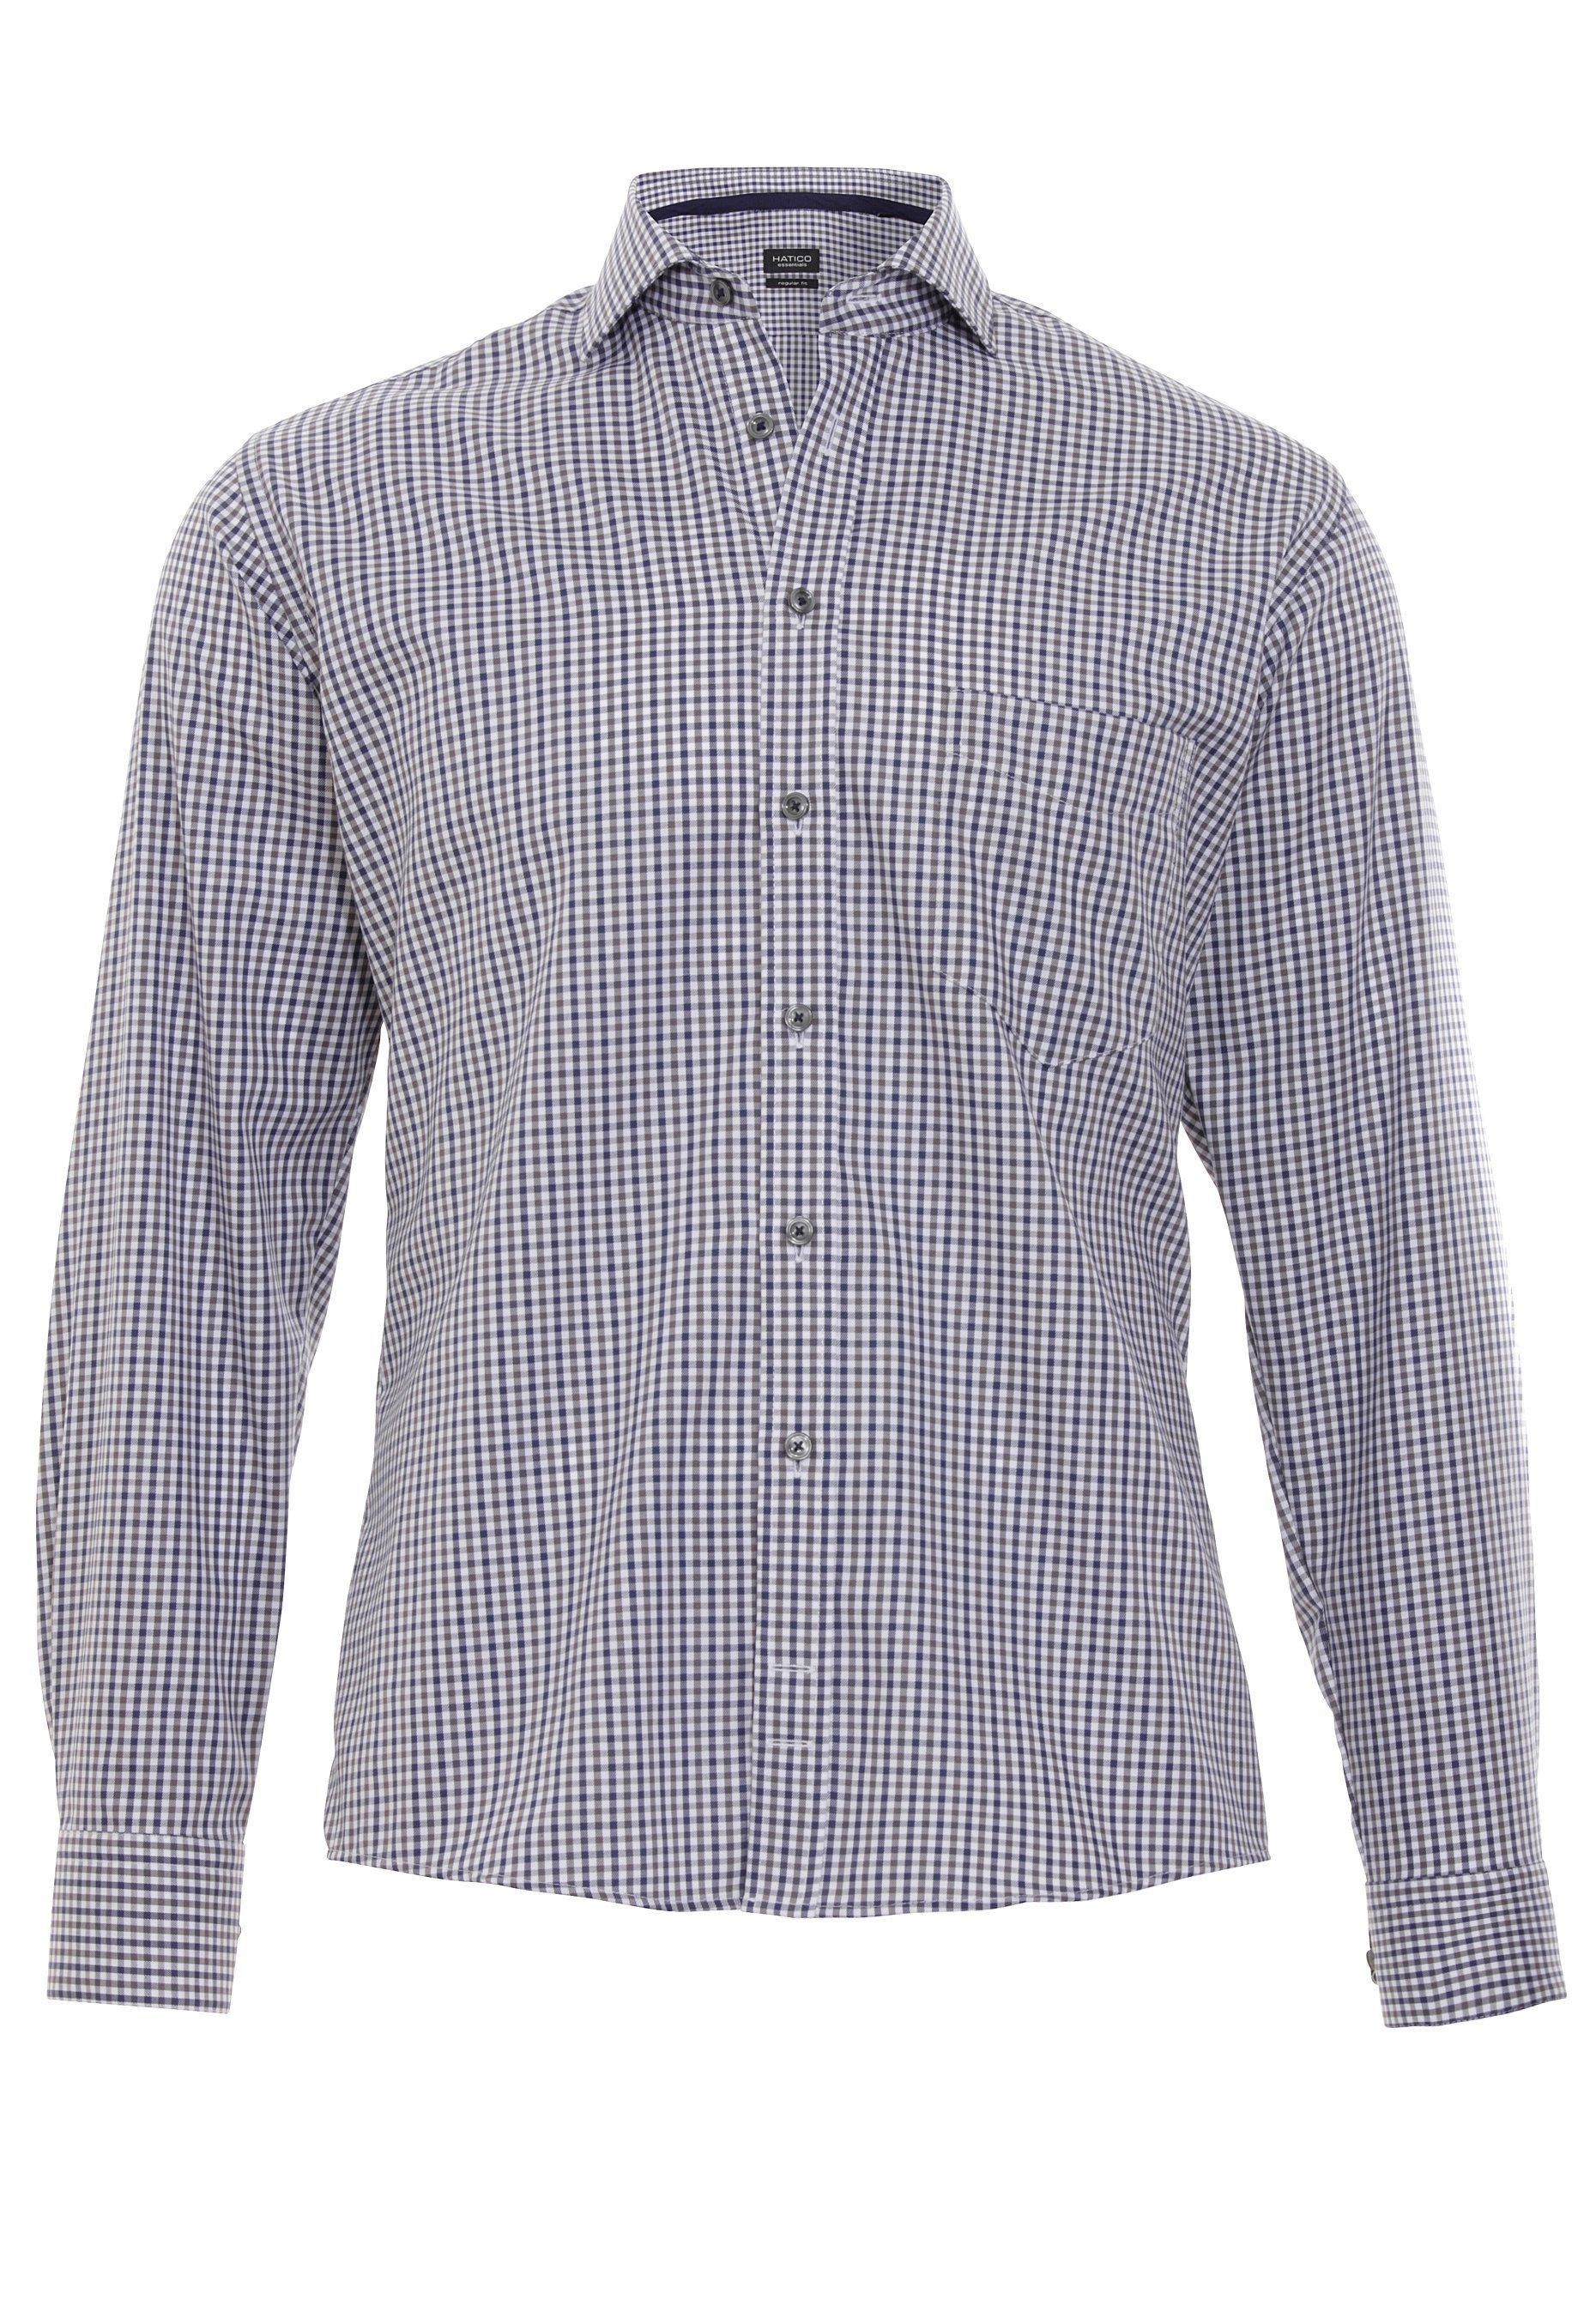 Hatico Essential Hemd Langarm